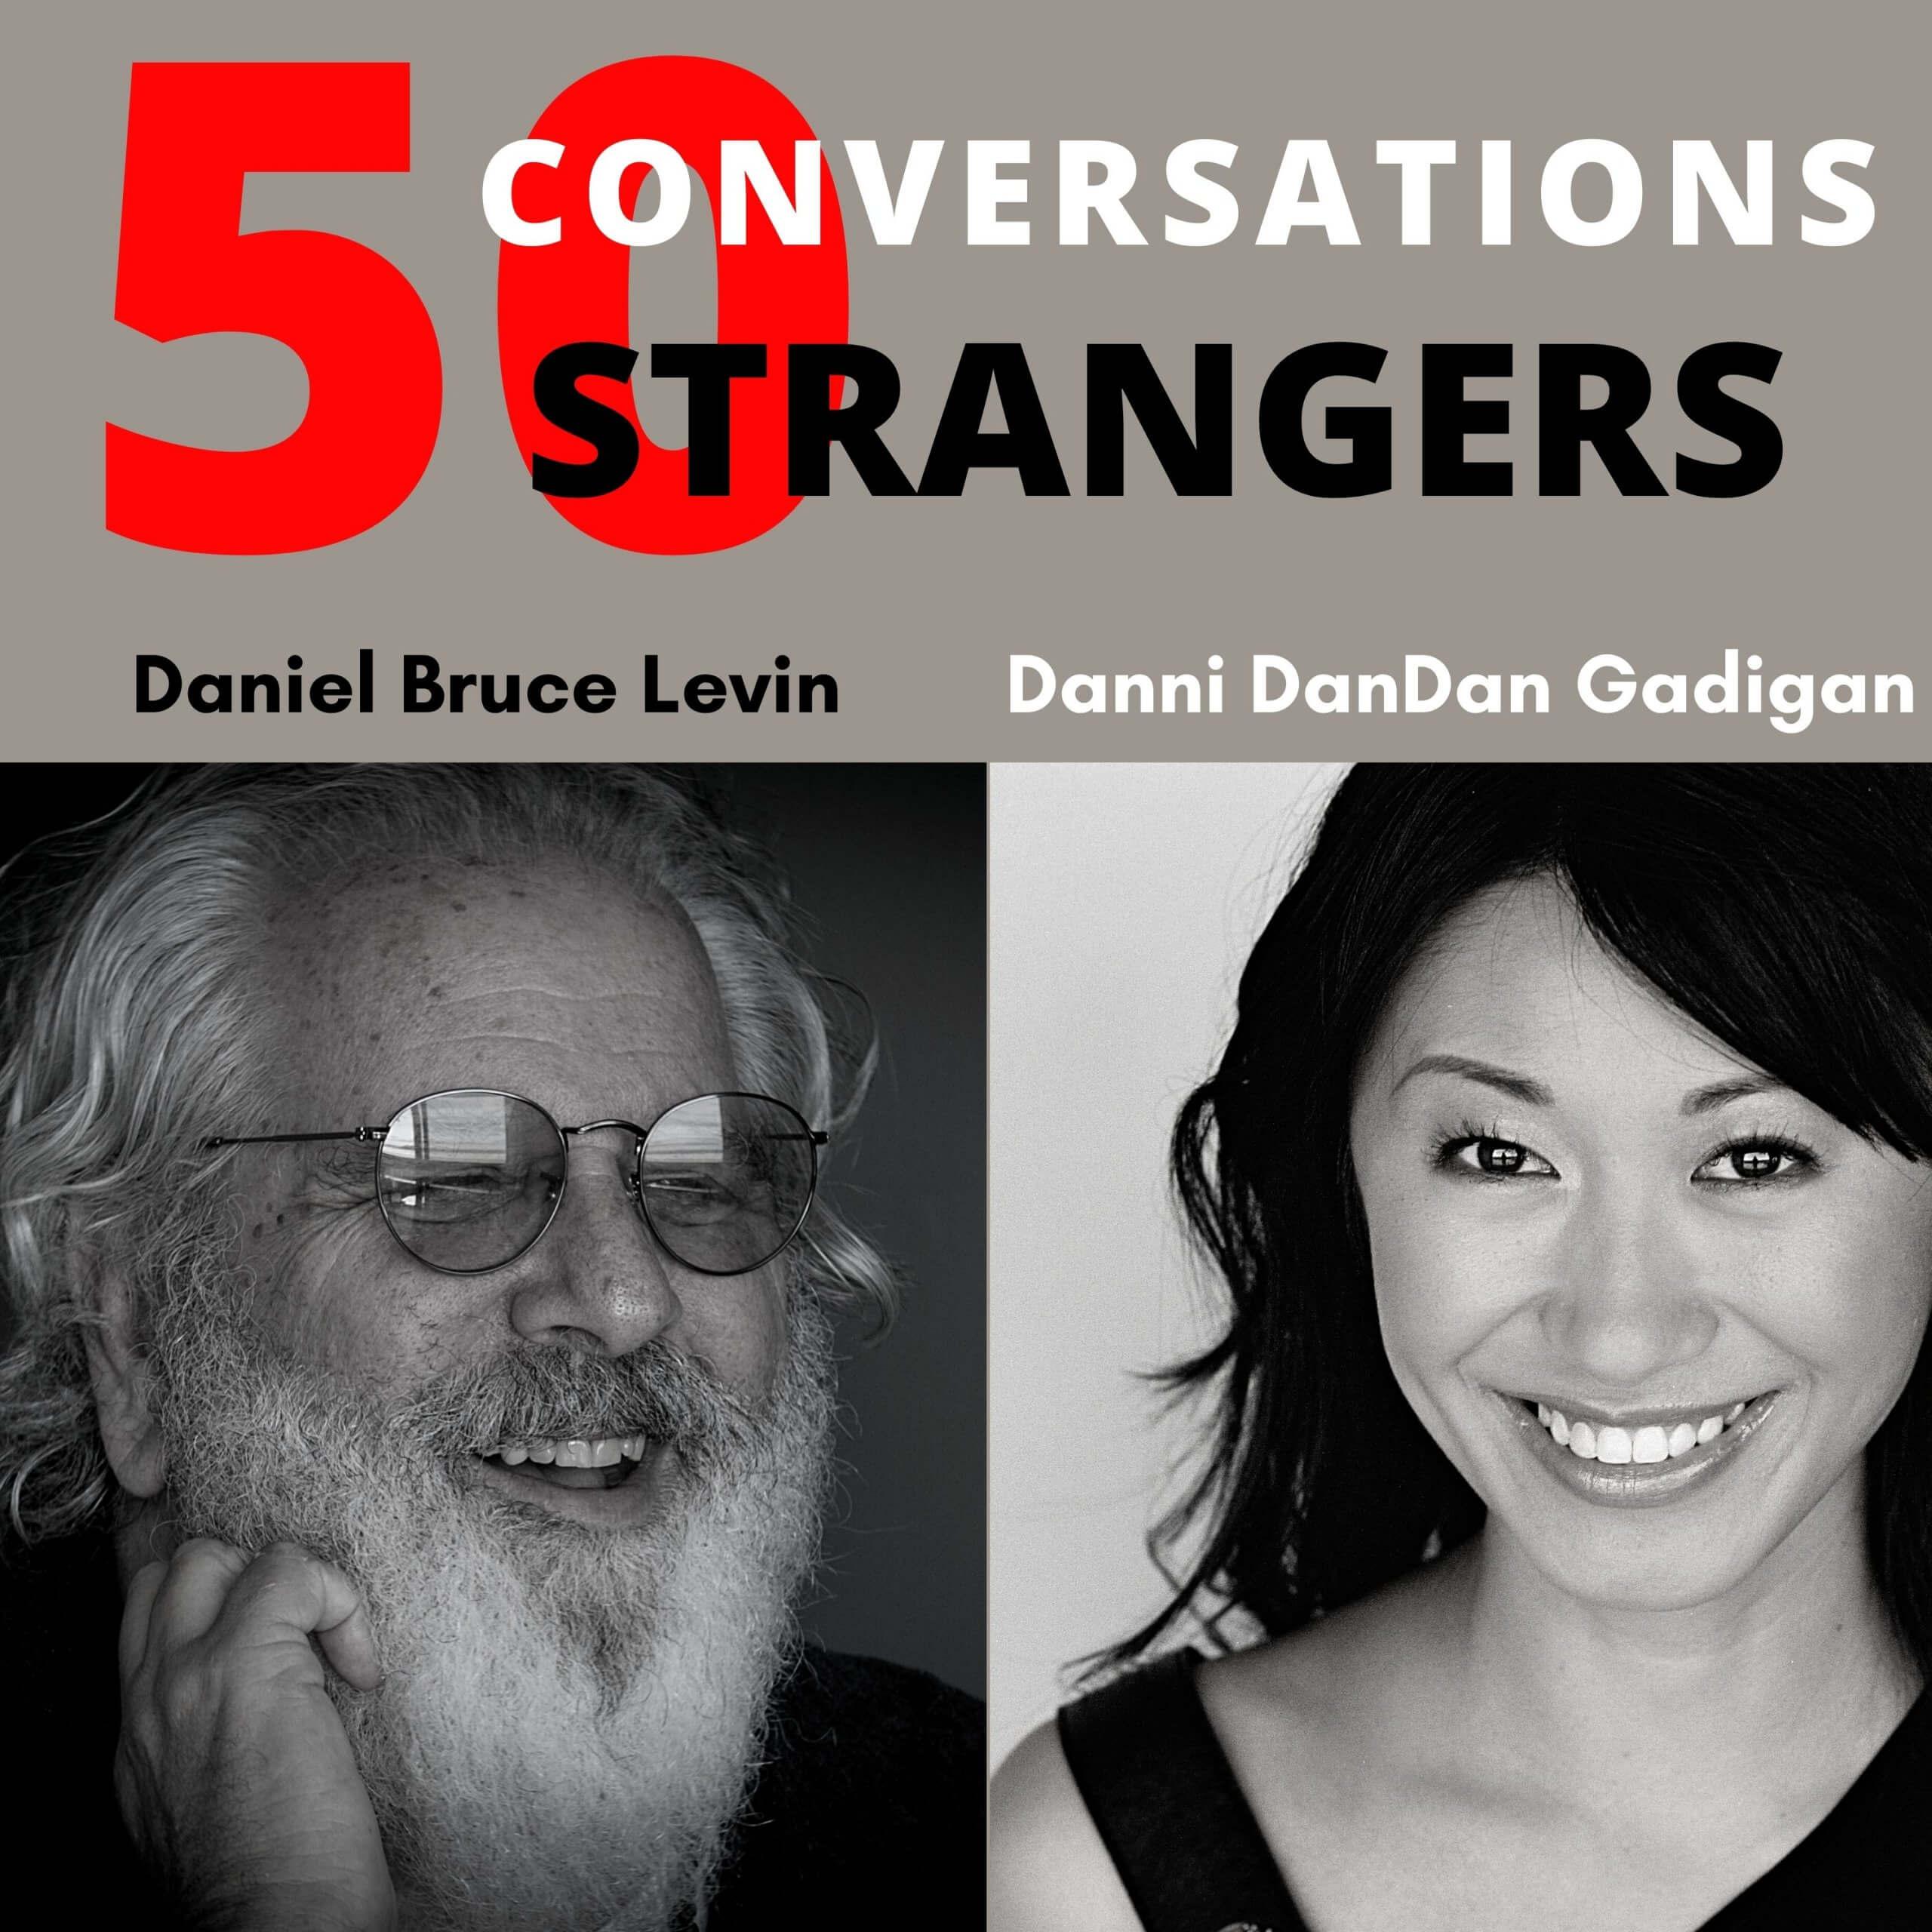 50 Conversations with 50 Strangers with Danni DanDan Gadigan